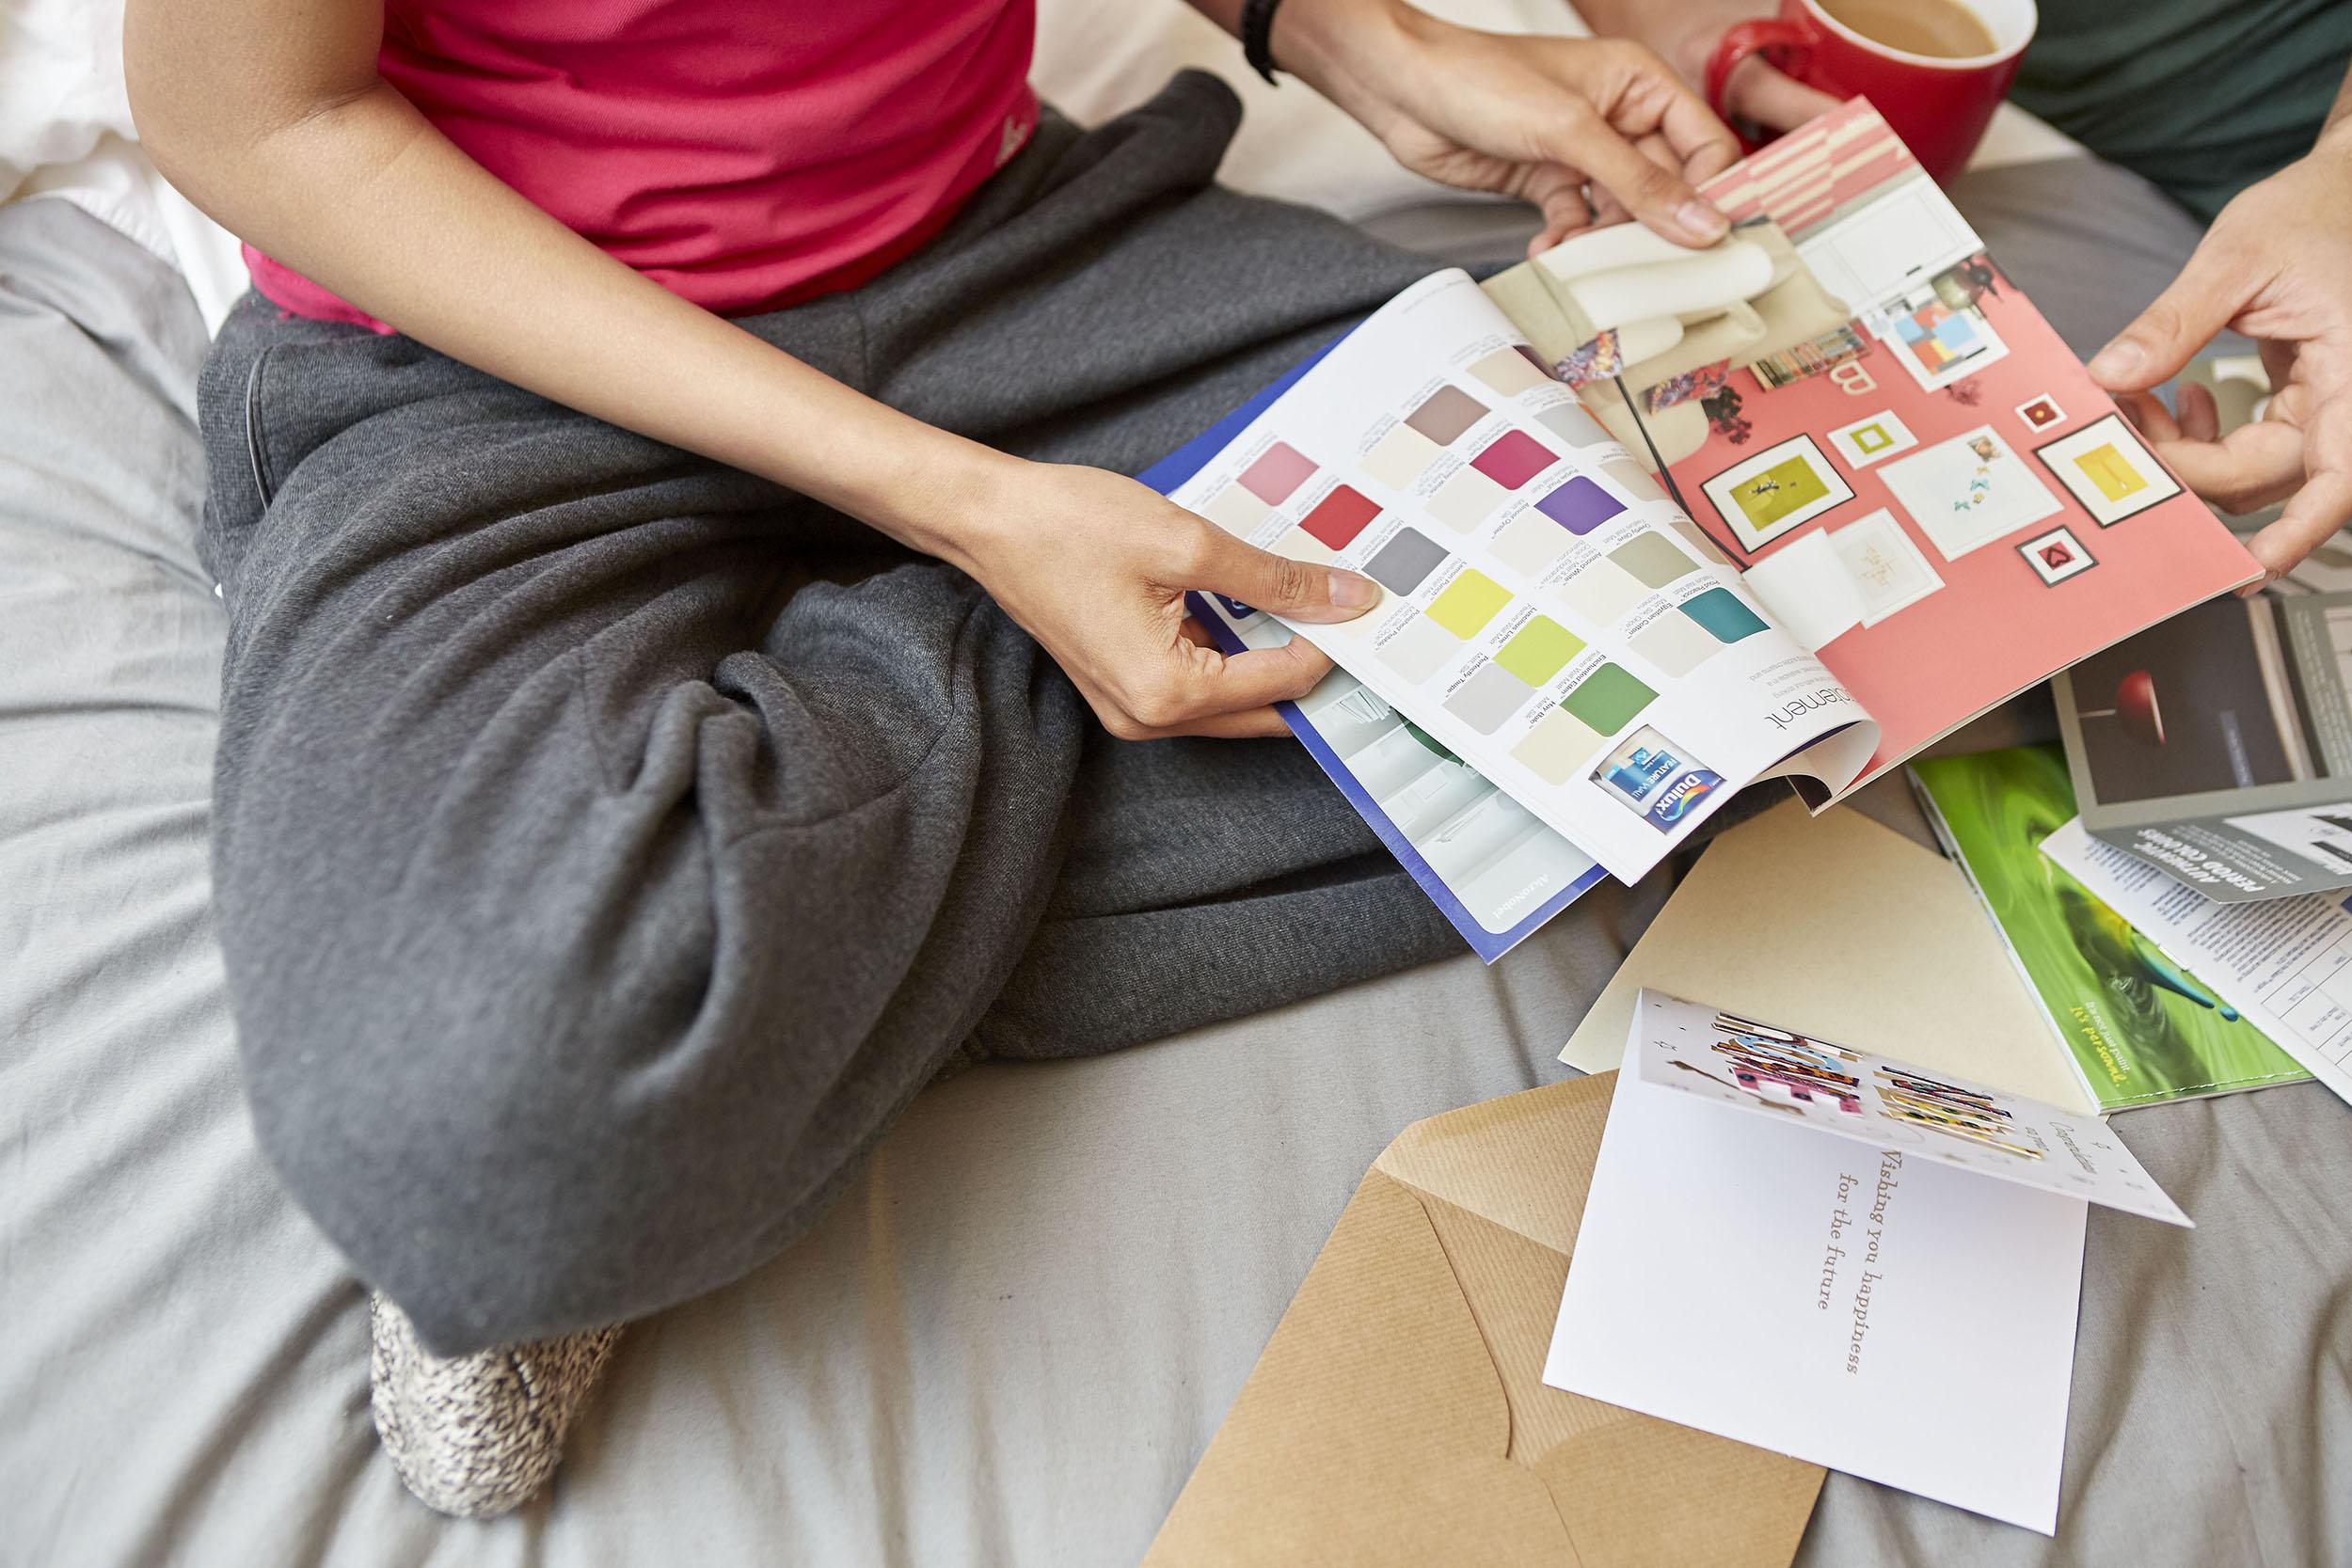 Principality_Bedroom_Couple_009__OE_5041.jpg